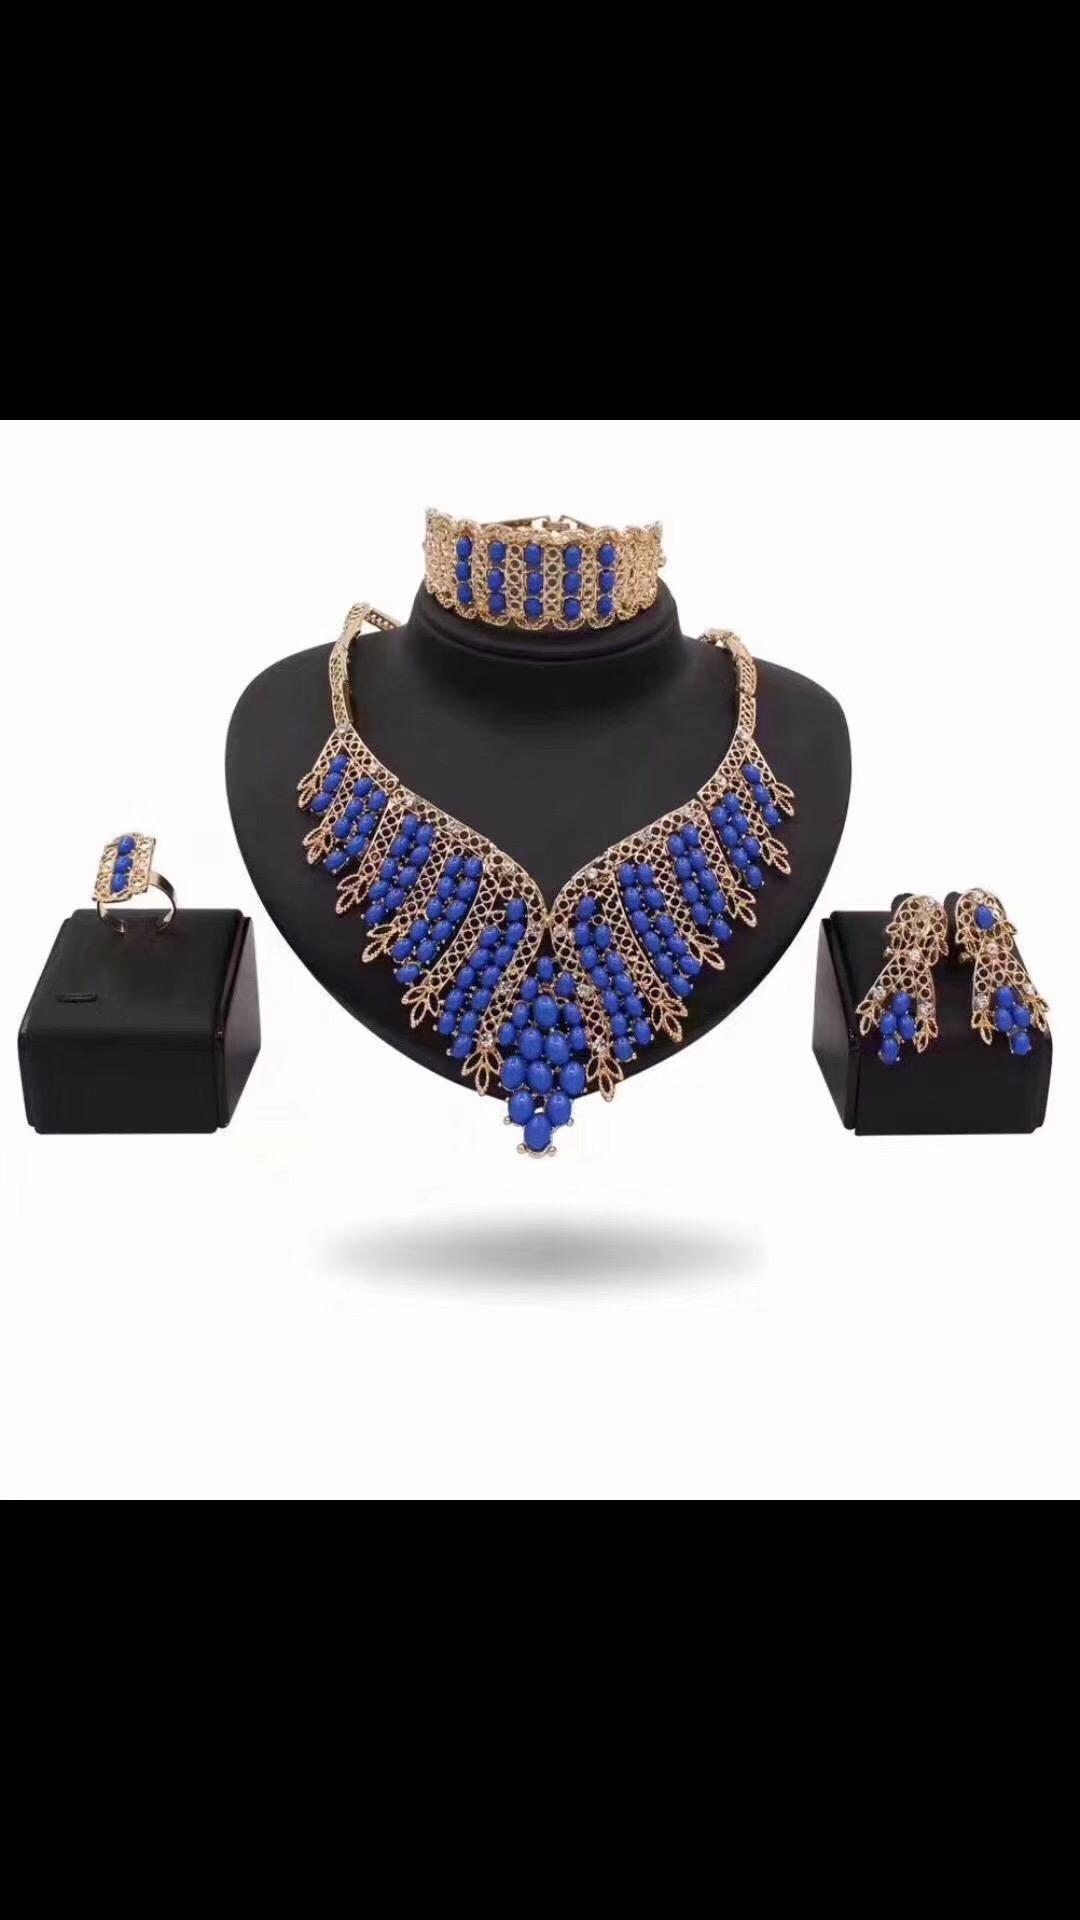 Quality jewelry sets